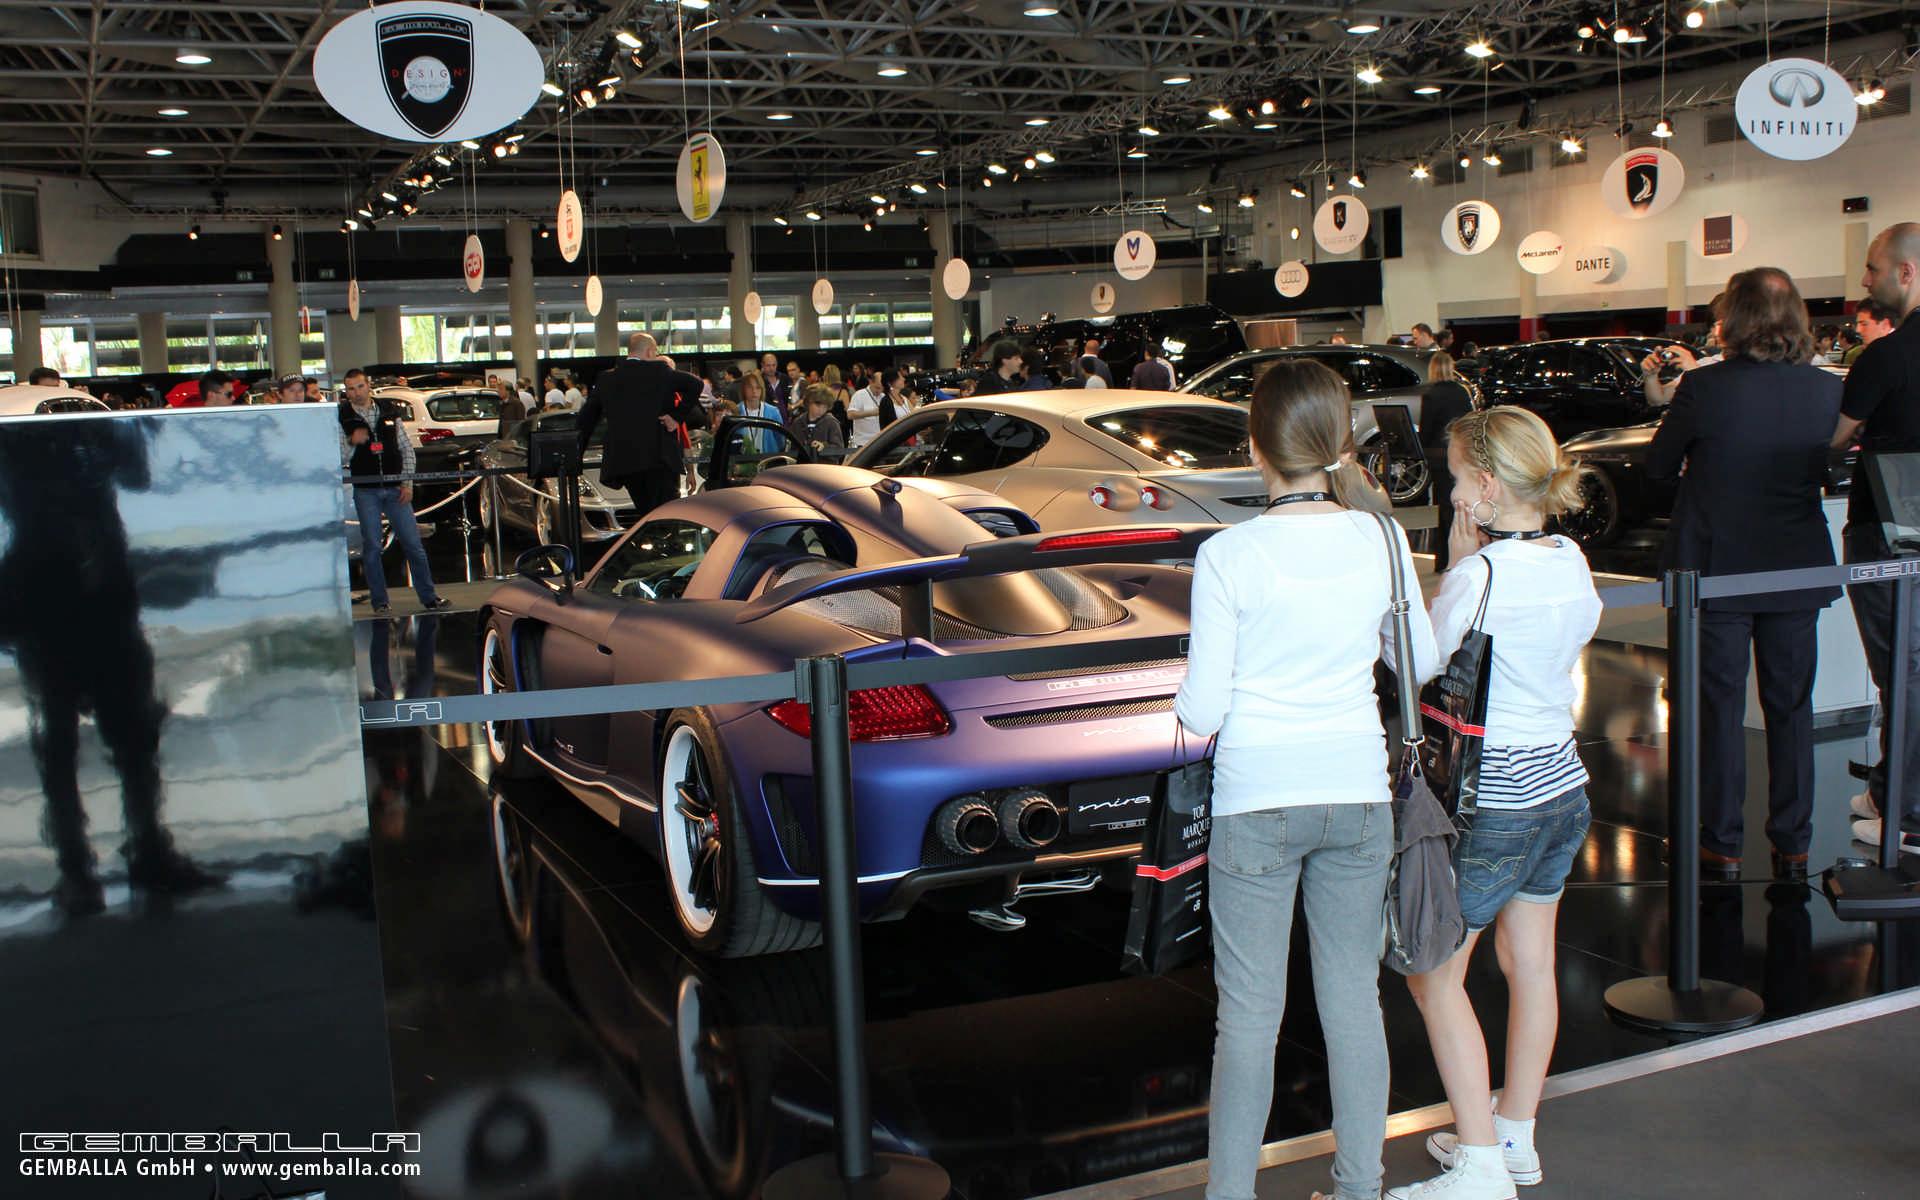 gemballa_gmbh_event_tm_2011_012